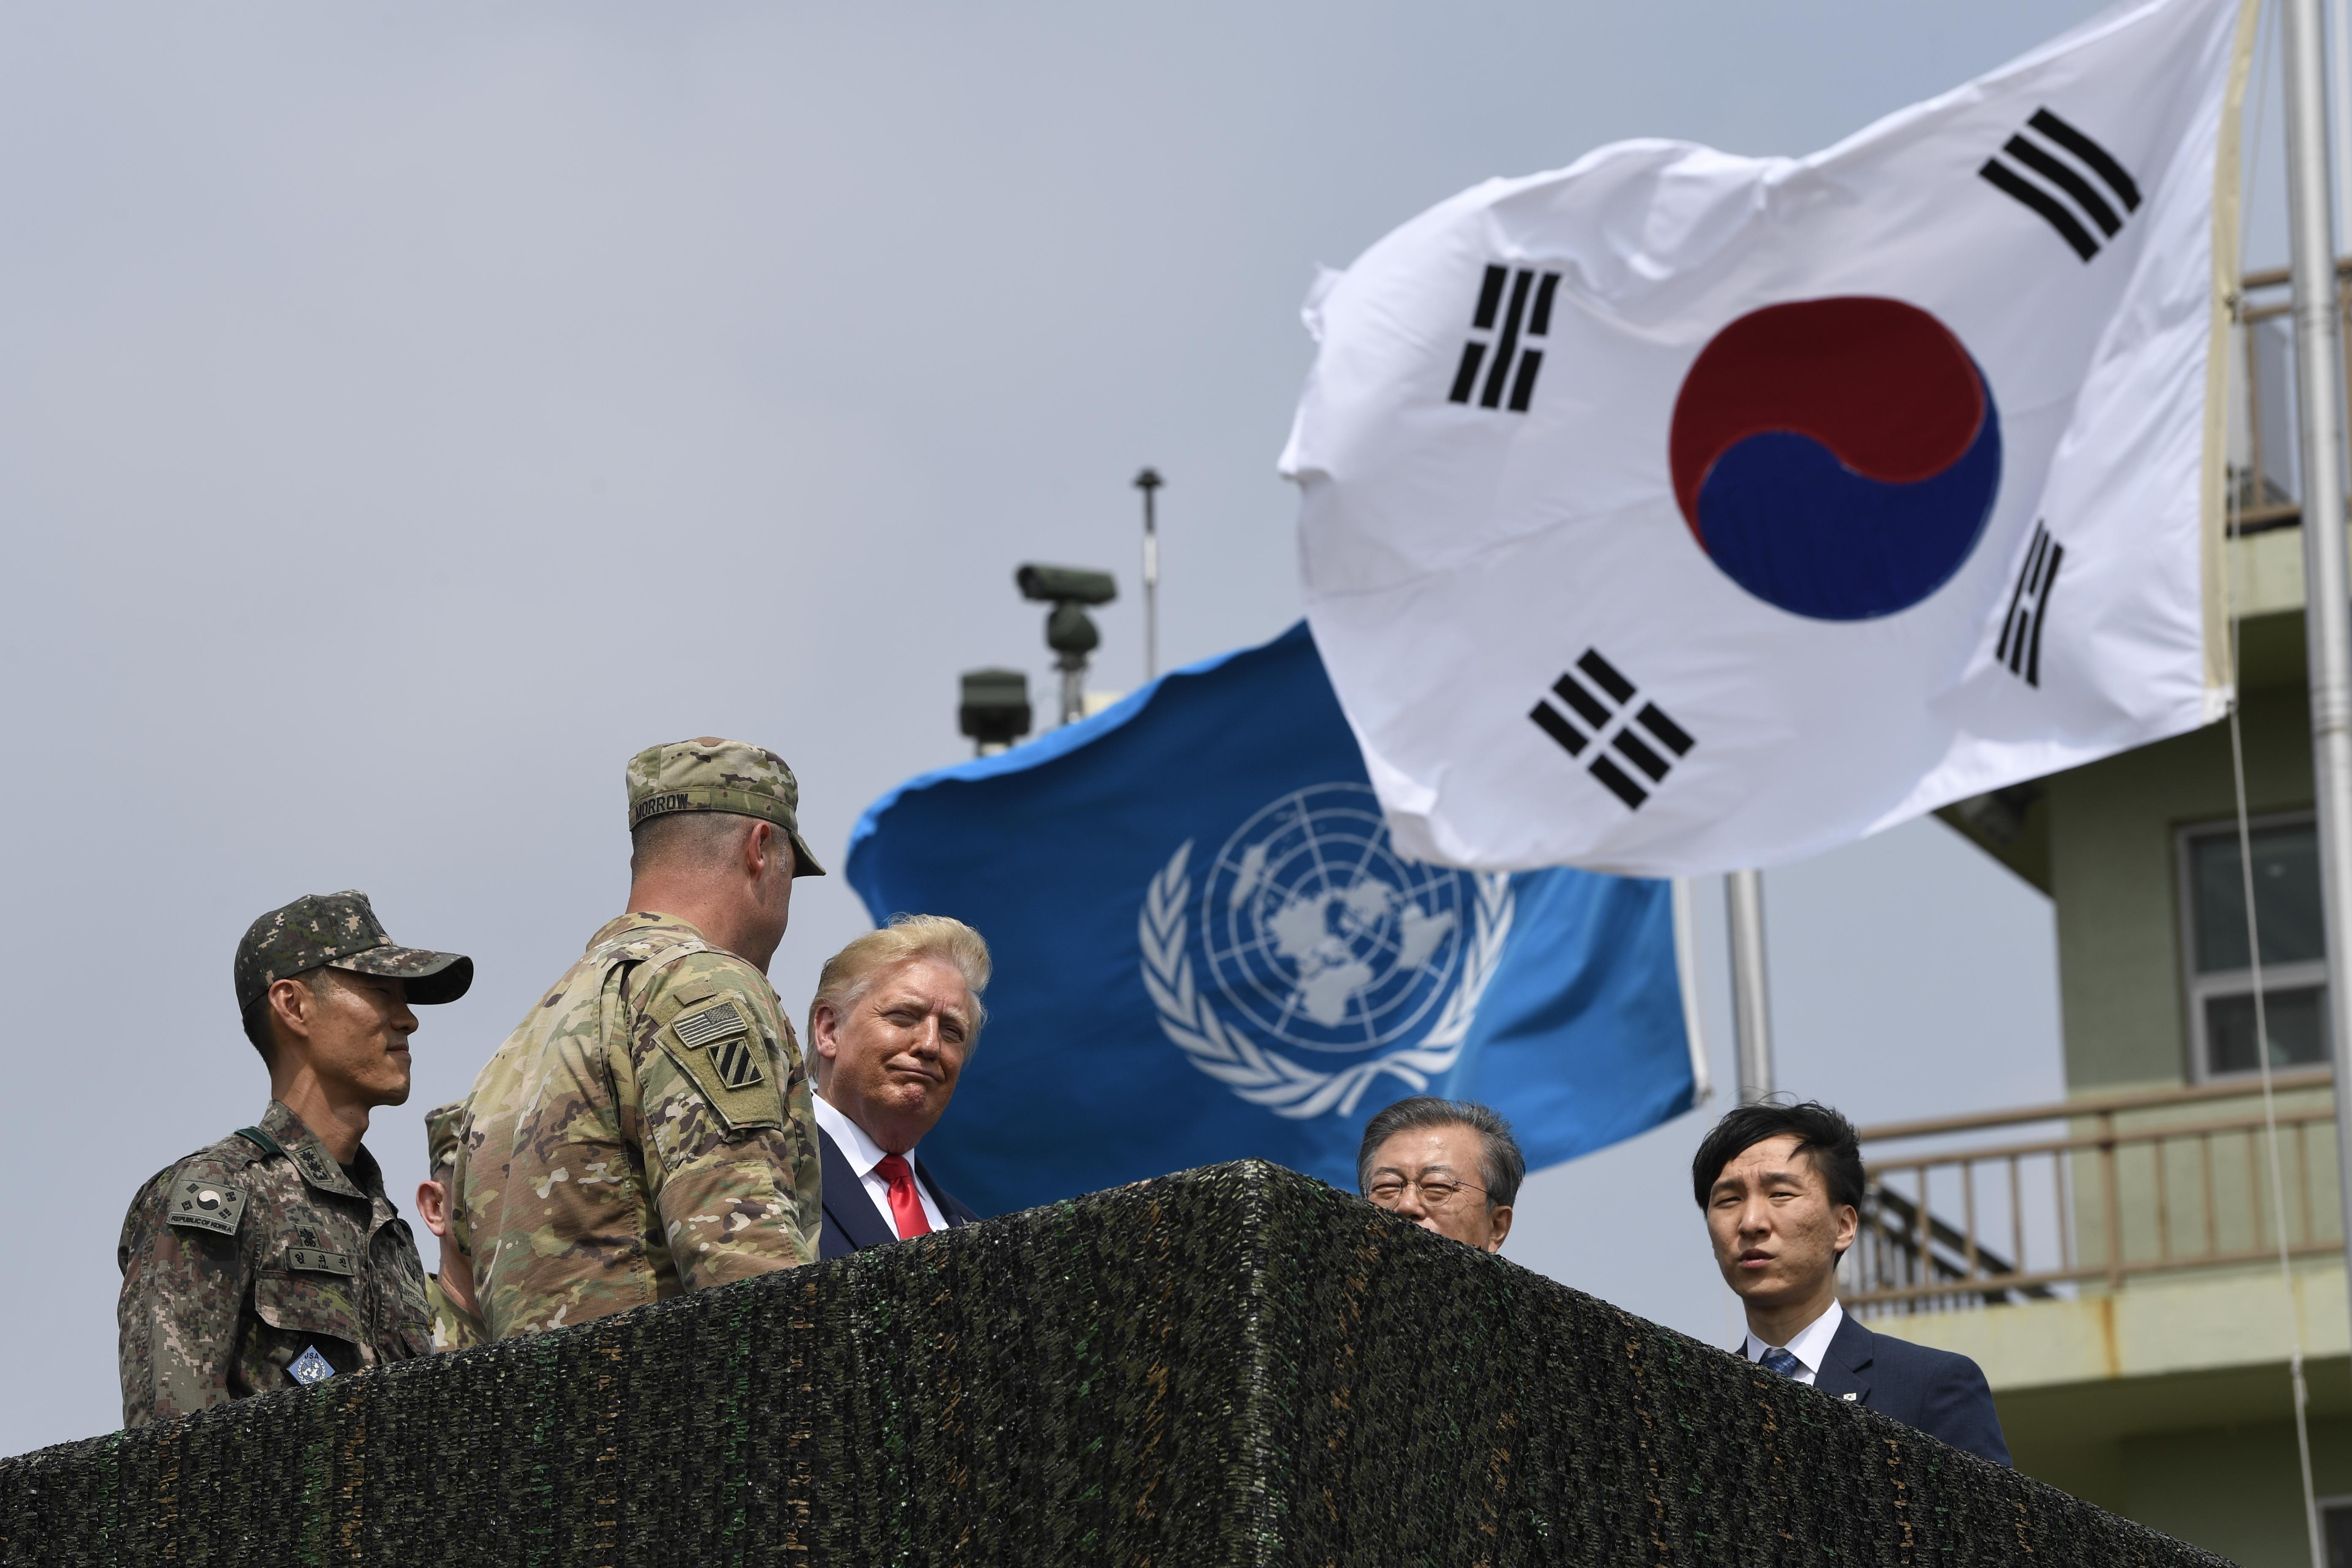 9179e9391df Ιστορική συνάντηση και χειραψία Τραμπ – Κιμ στα κορεατικά σύνορα ...